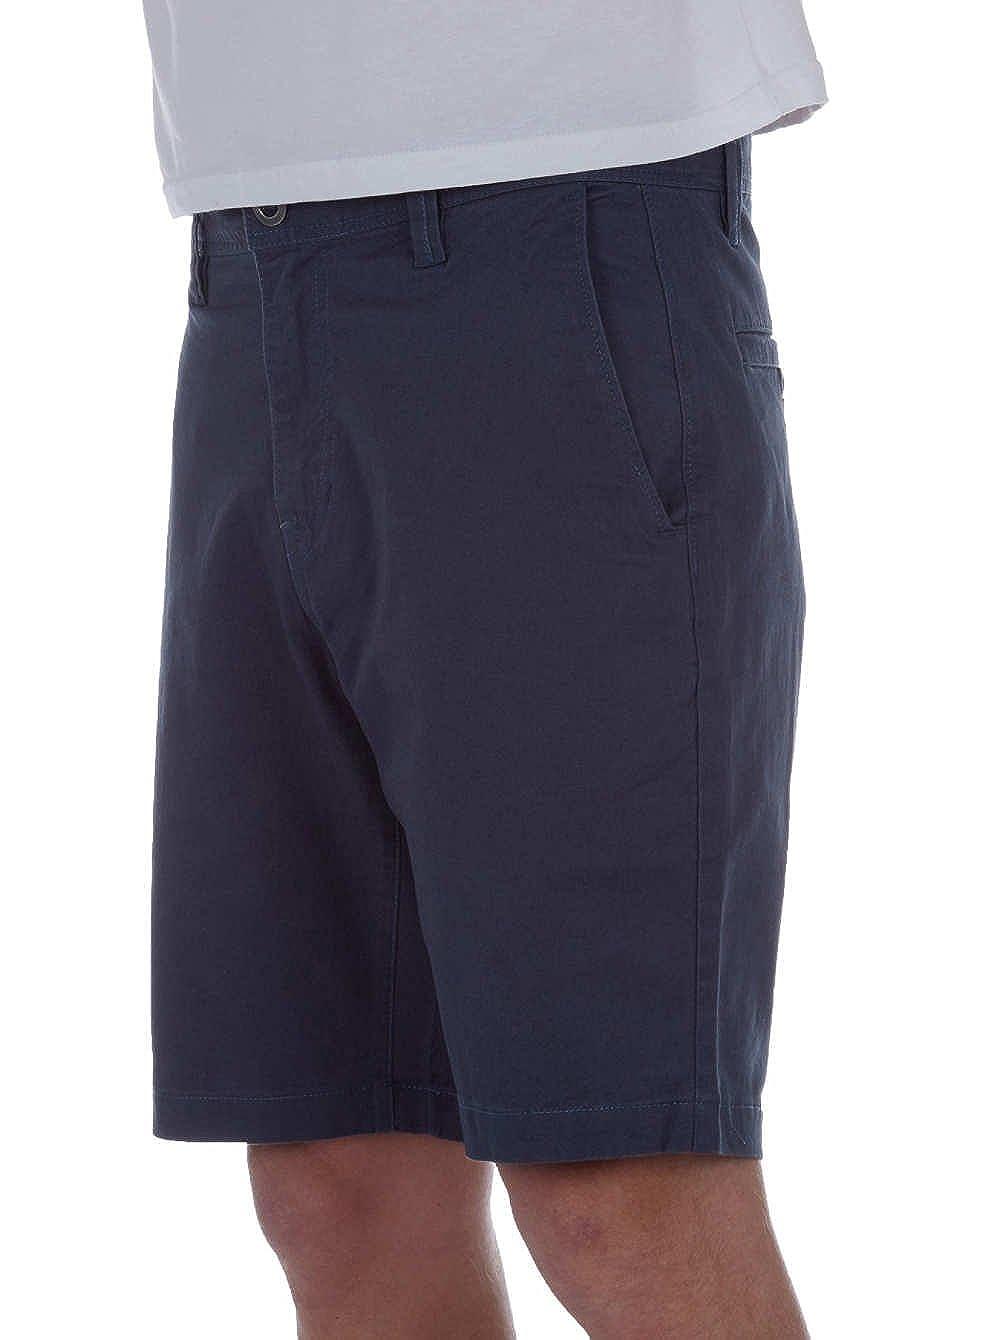 TALLA 30. Volcom Frickin Slim Chino Short Azul Pantalones Cortos para